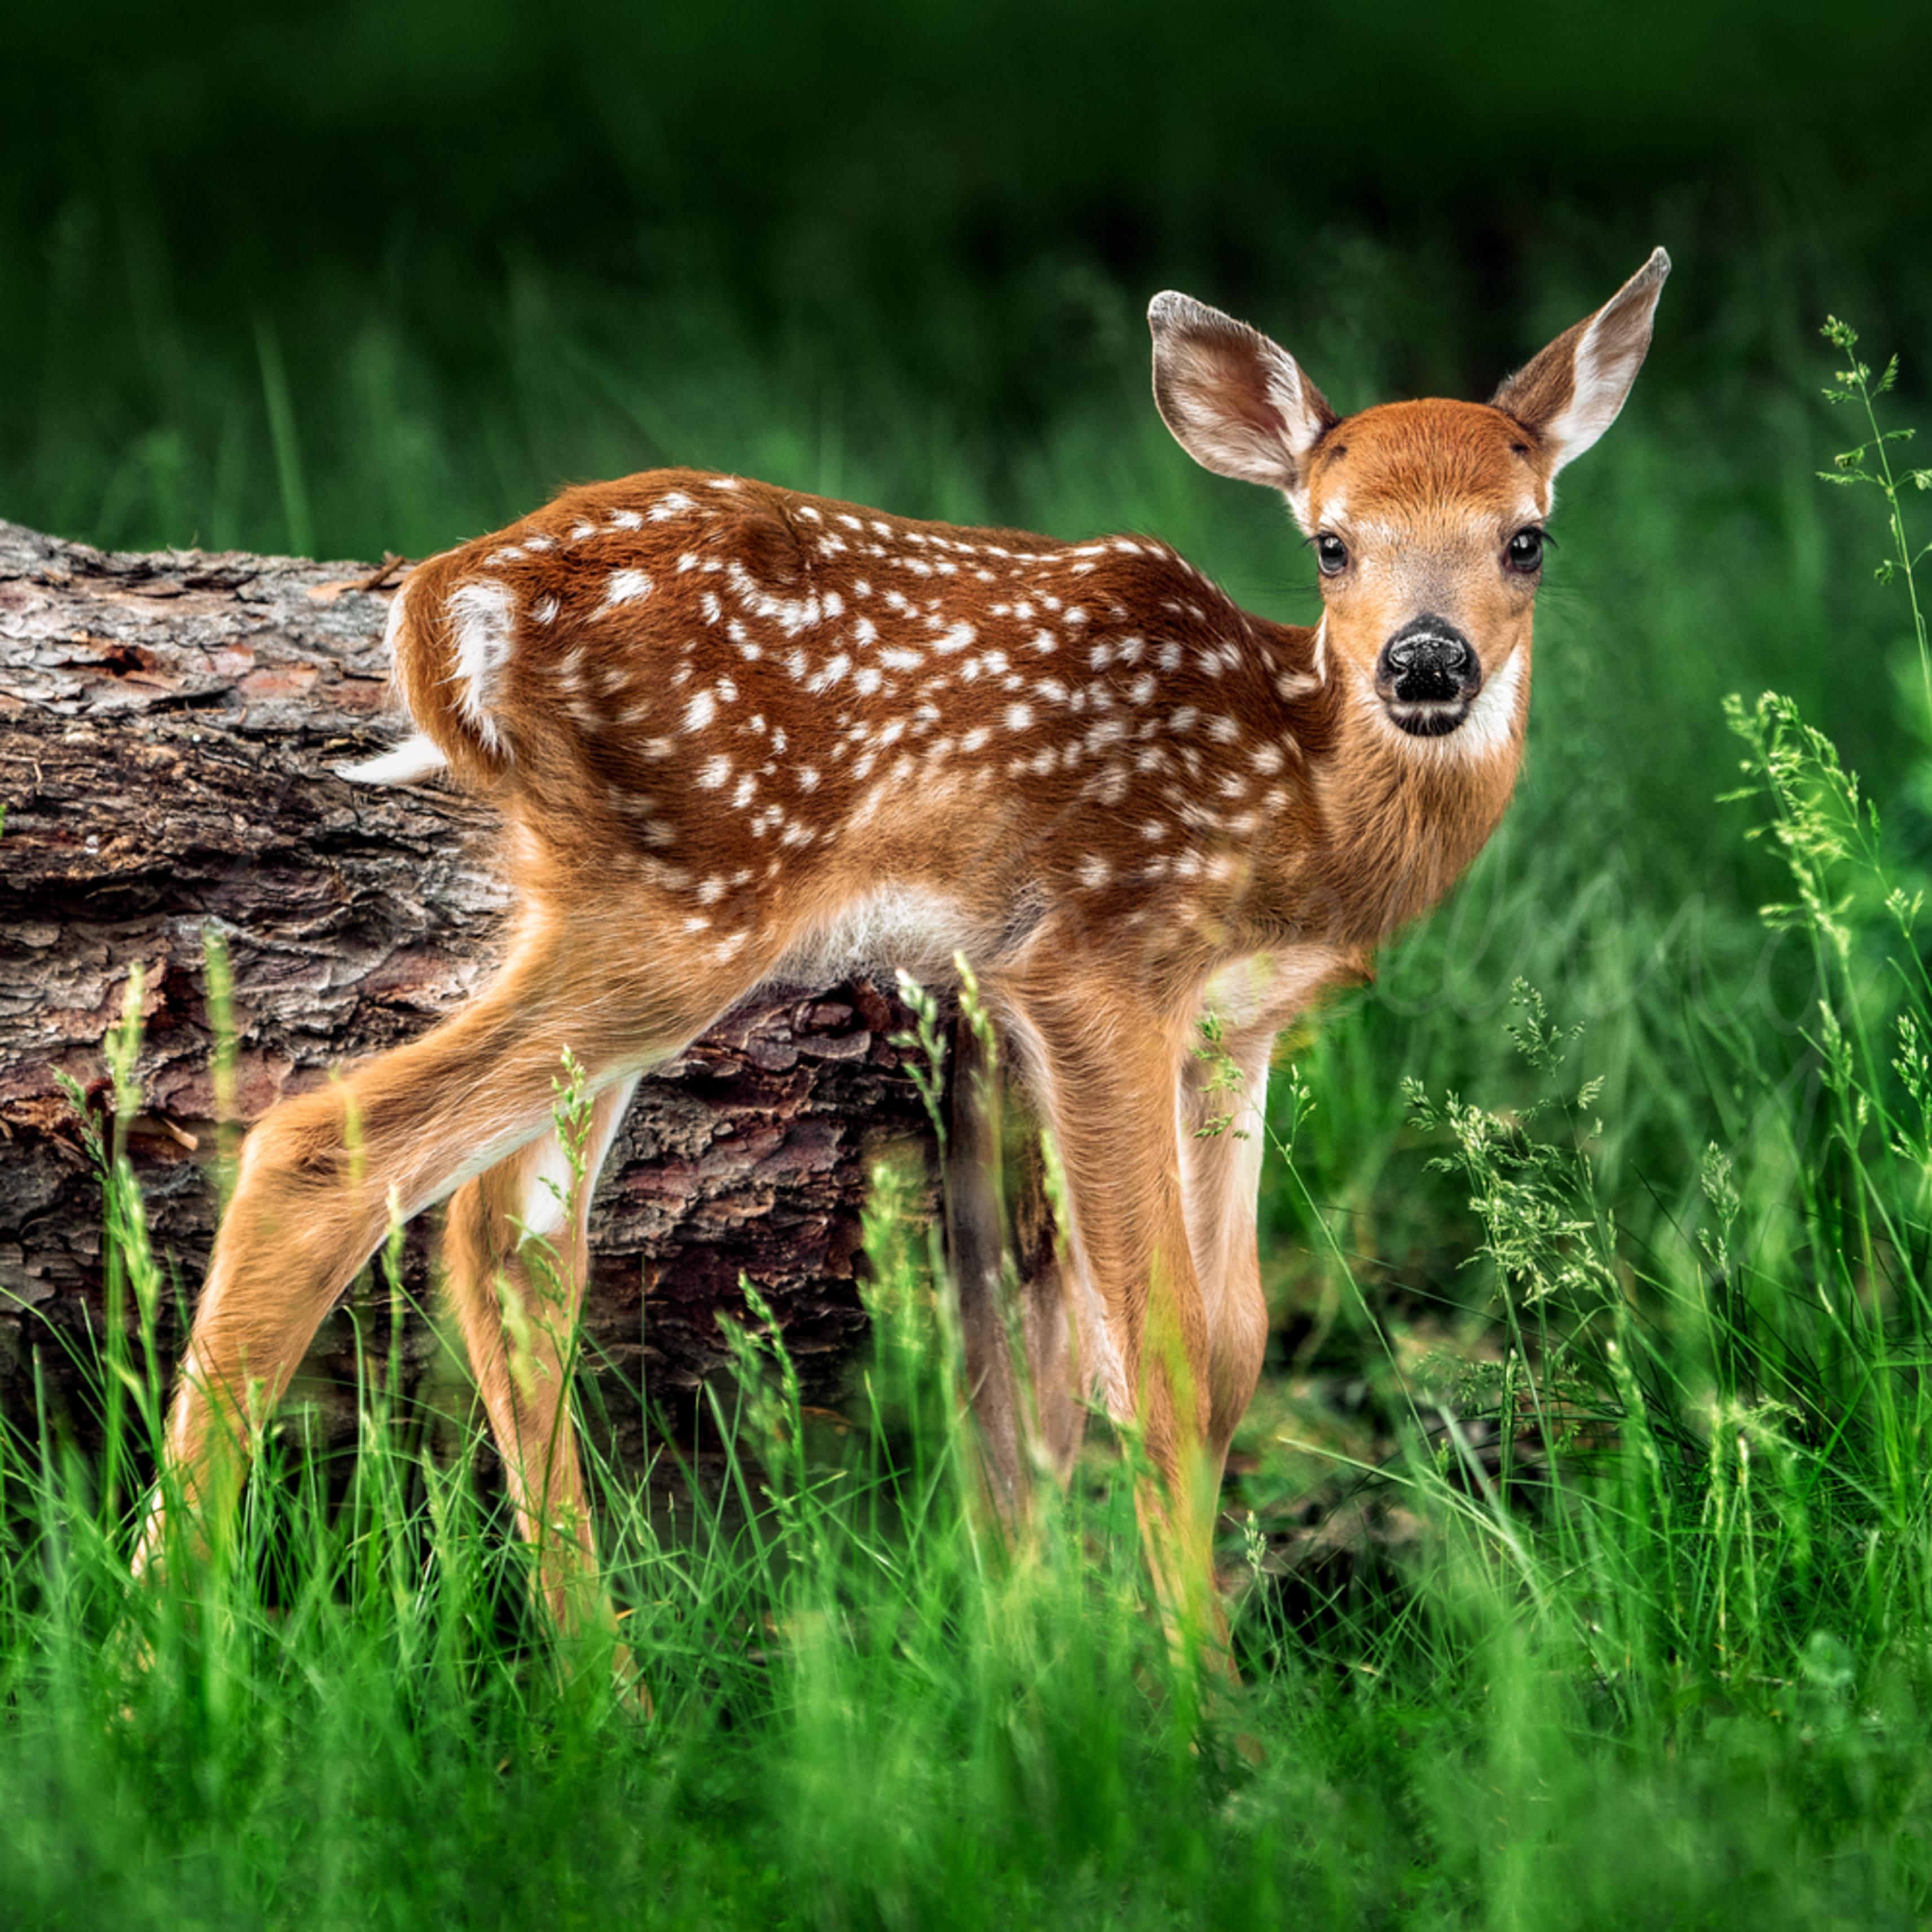 Bambi eftd57